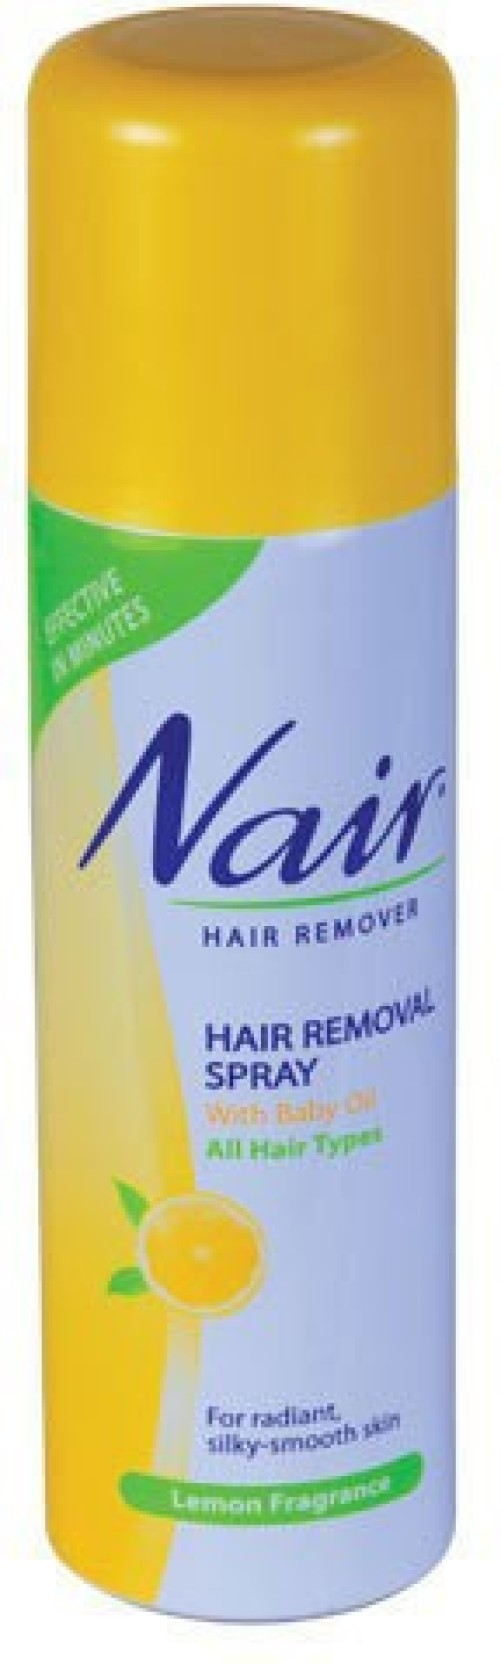 Nair Lemon Hair Removal Spray Cream Price In India Buy Nair